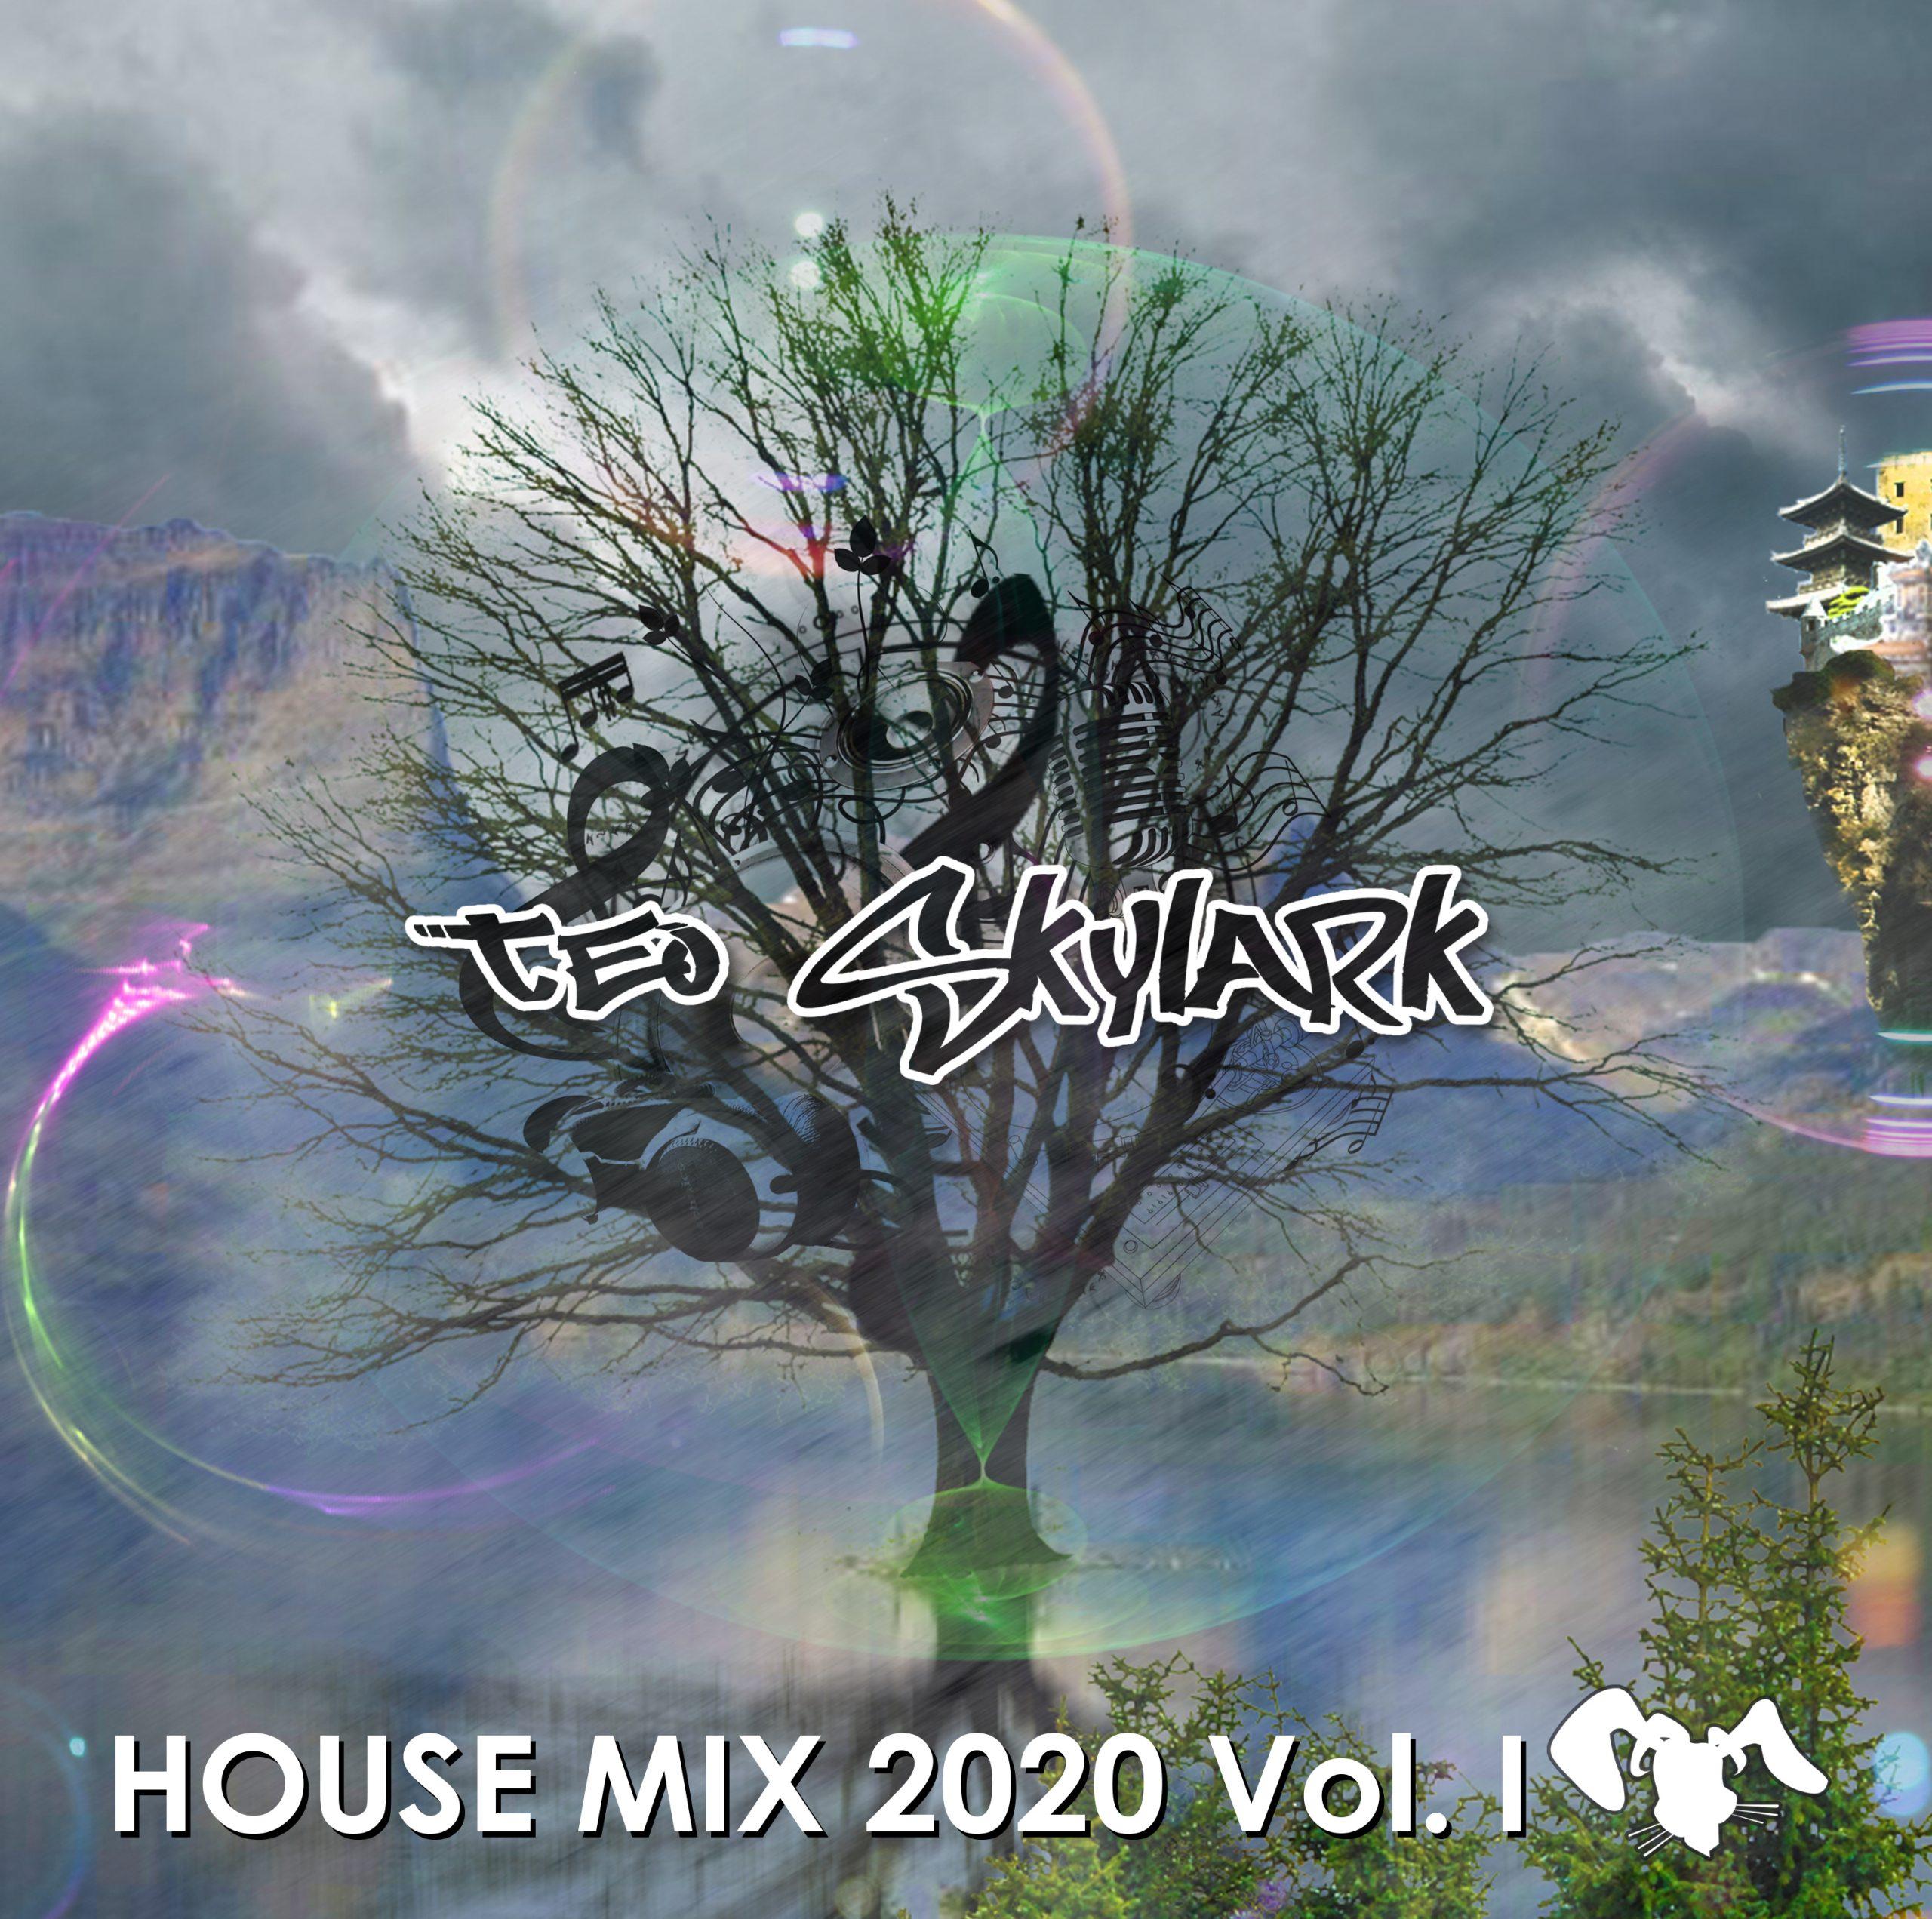 House Mix 2020 Vol. 1